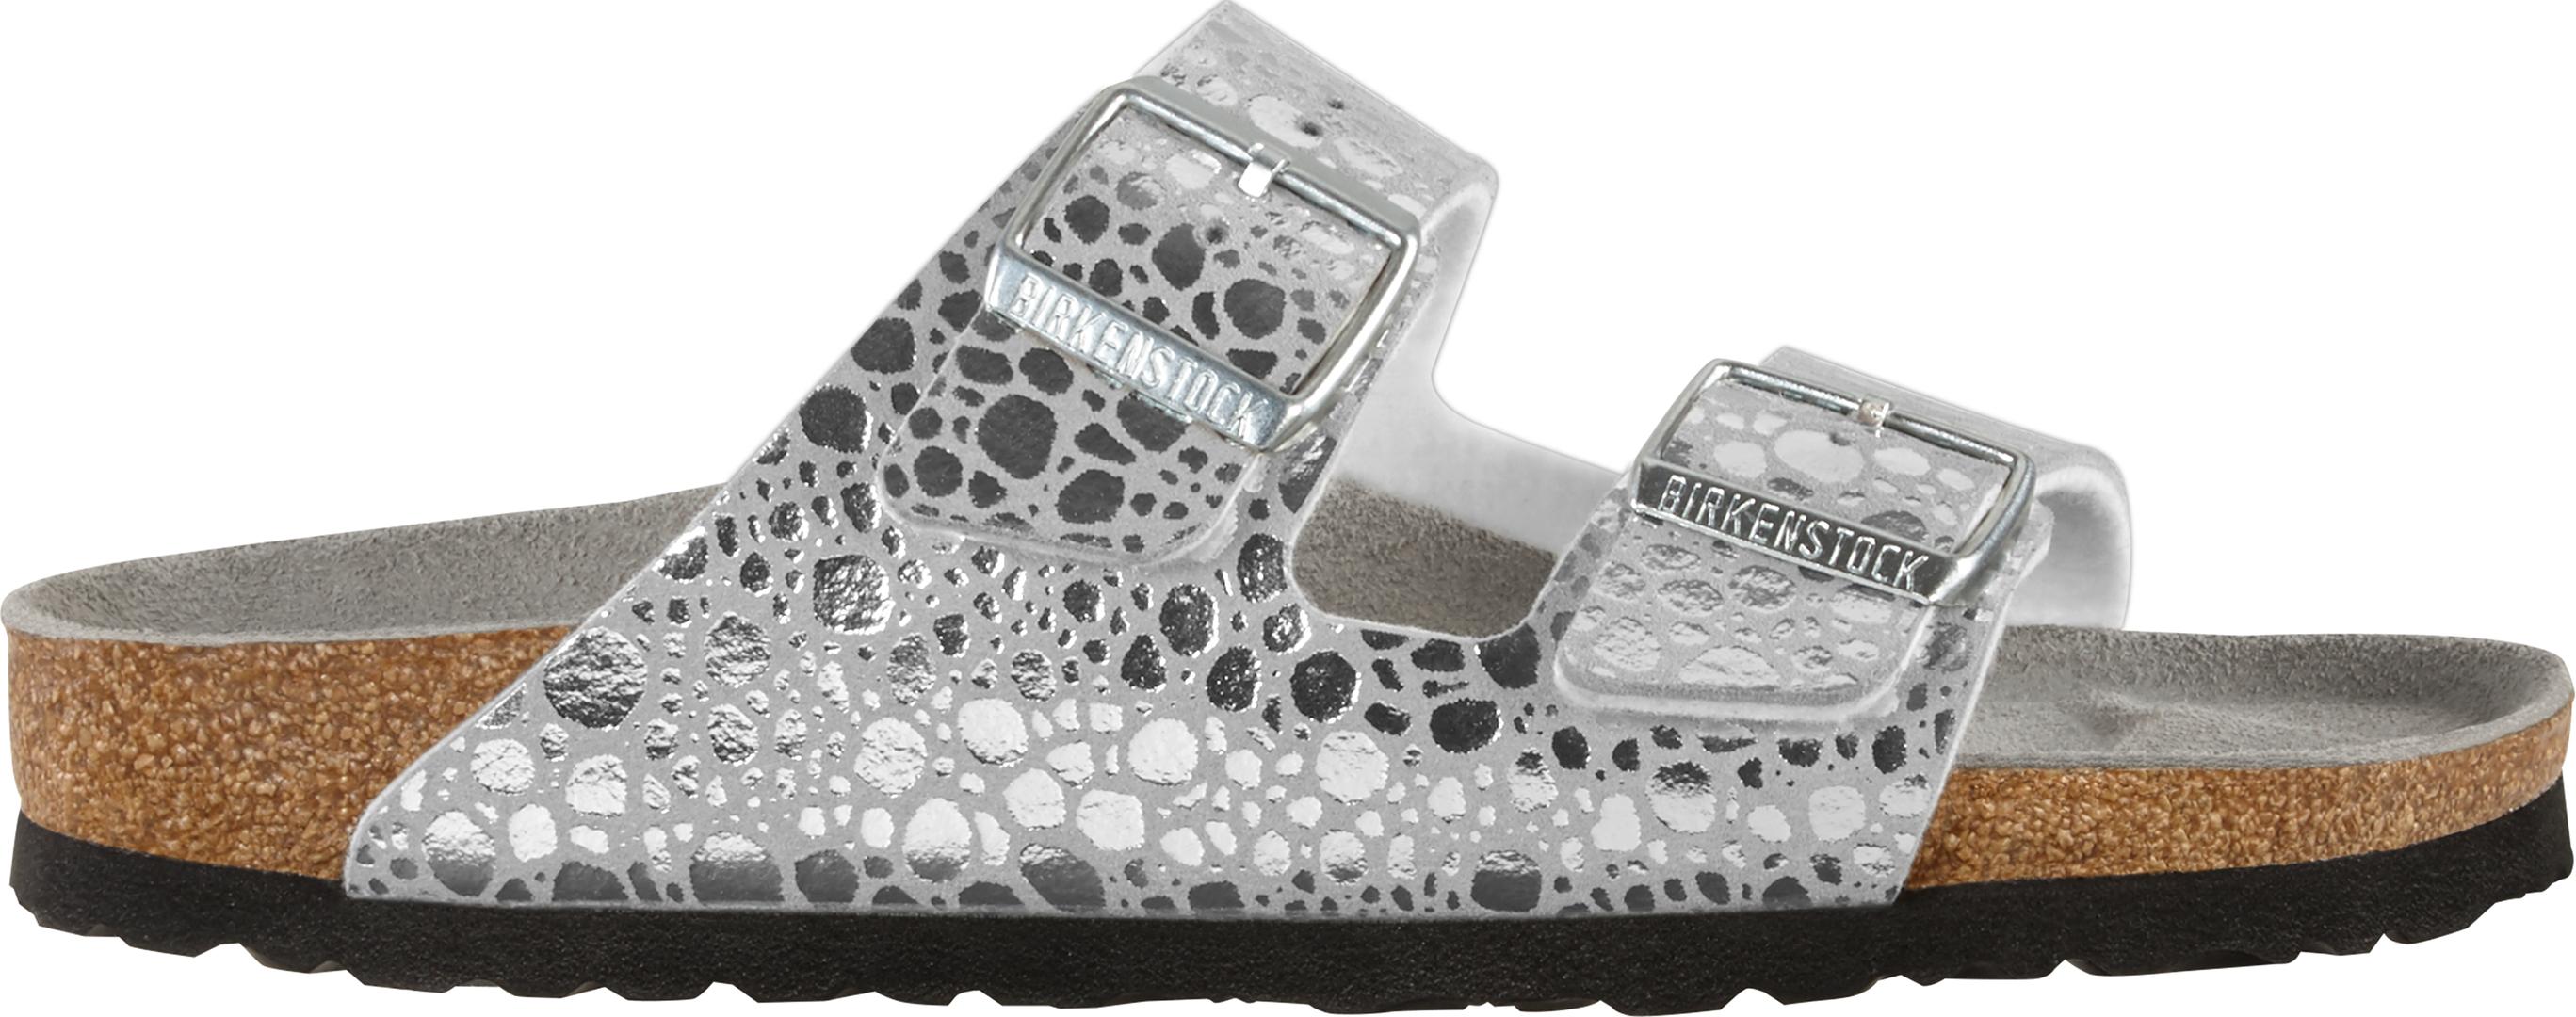 f69221c0780 ARIZONA SLIM Sandal 2019 metallic stones silver grey